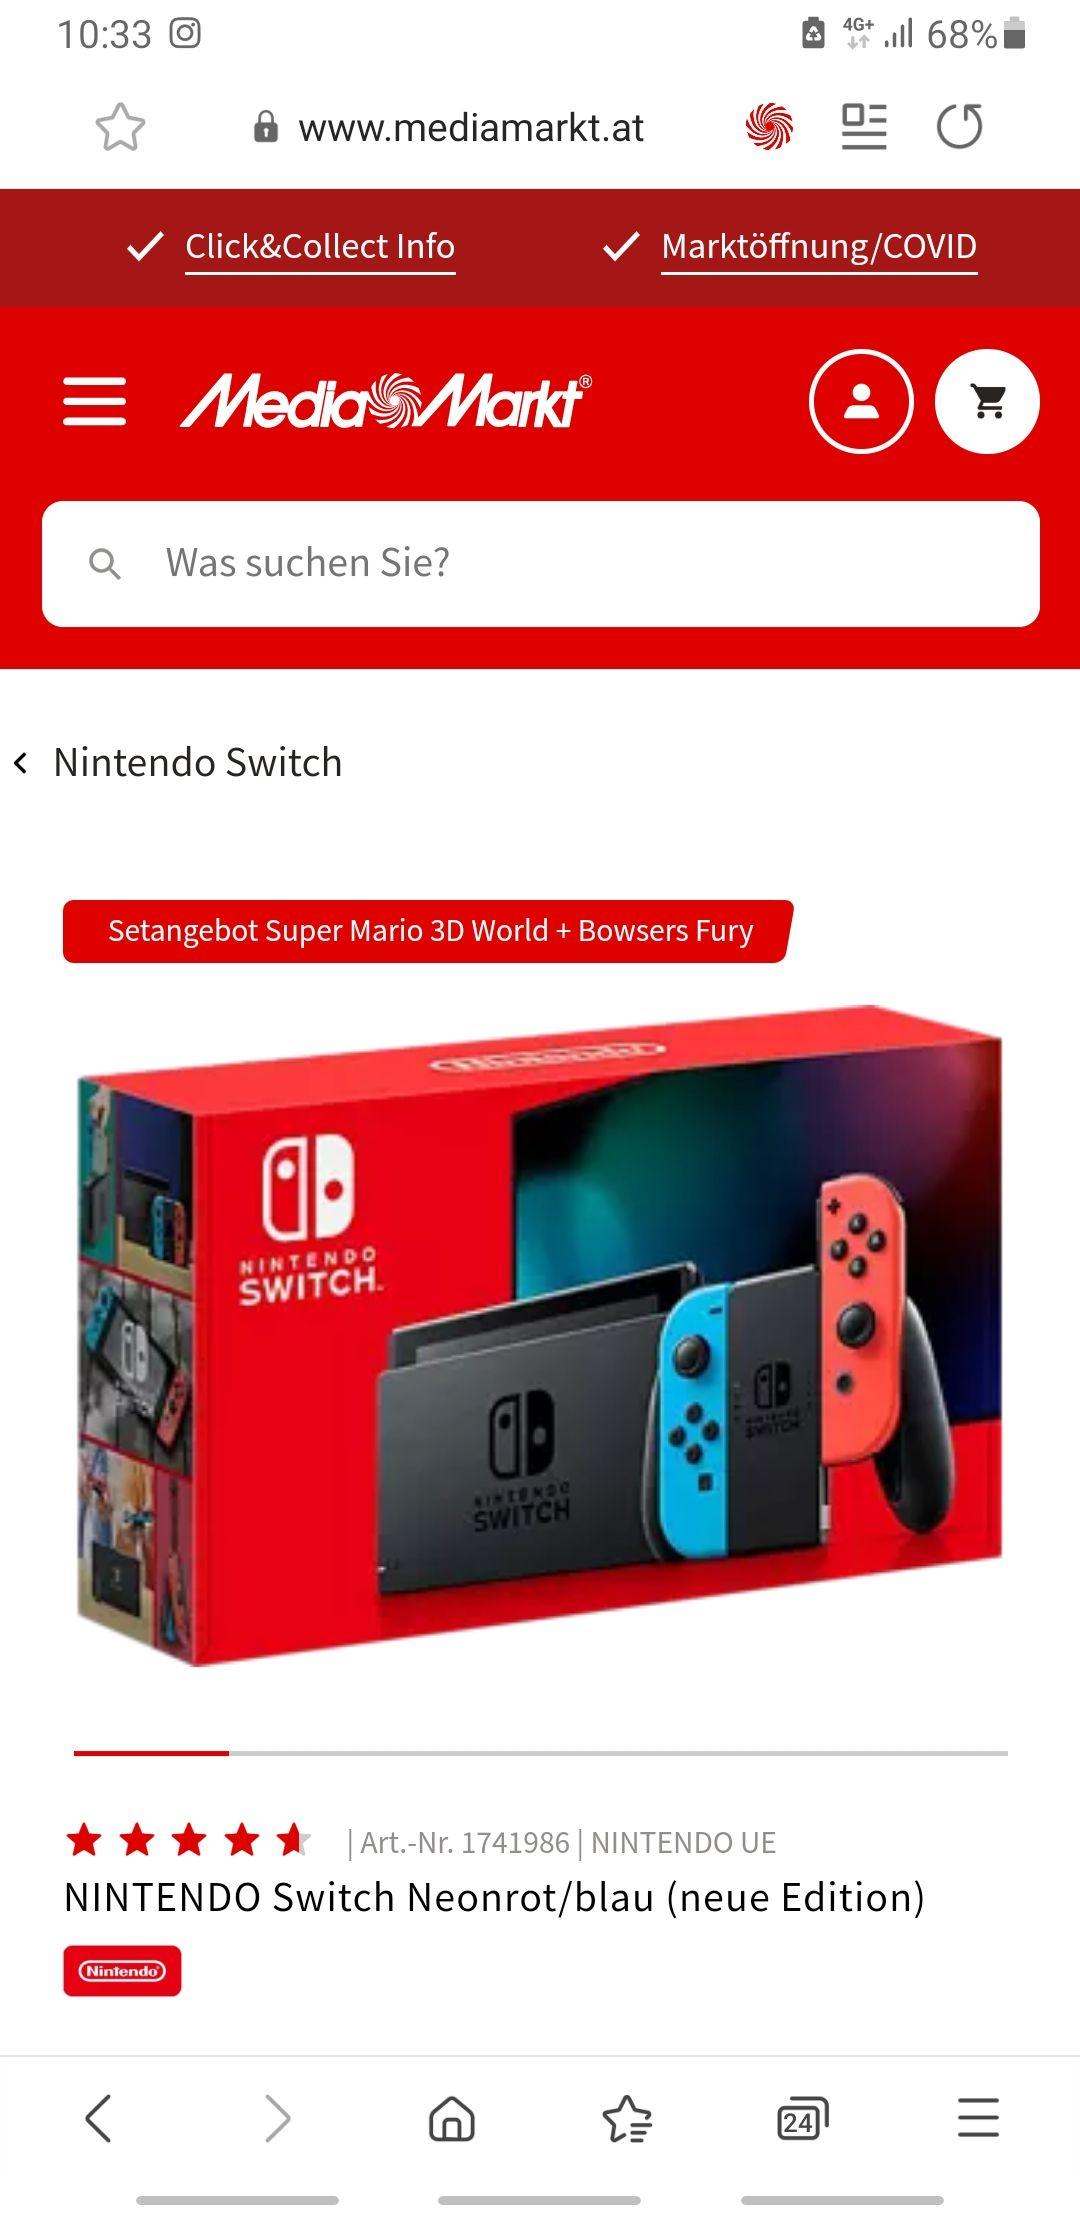 Nintendo Switch Bundle mit Super Mario 3D World + Bowsers Fury